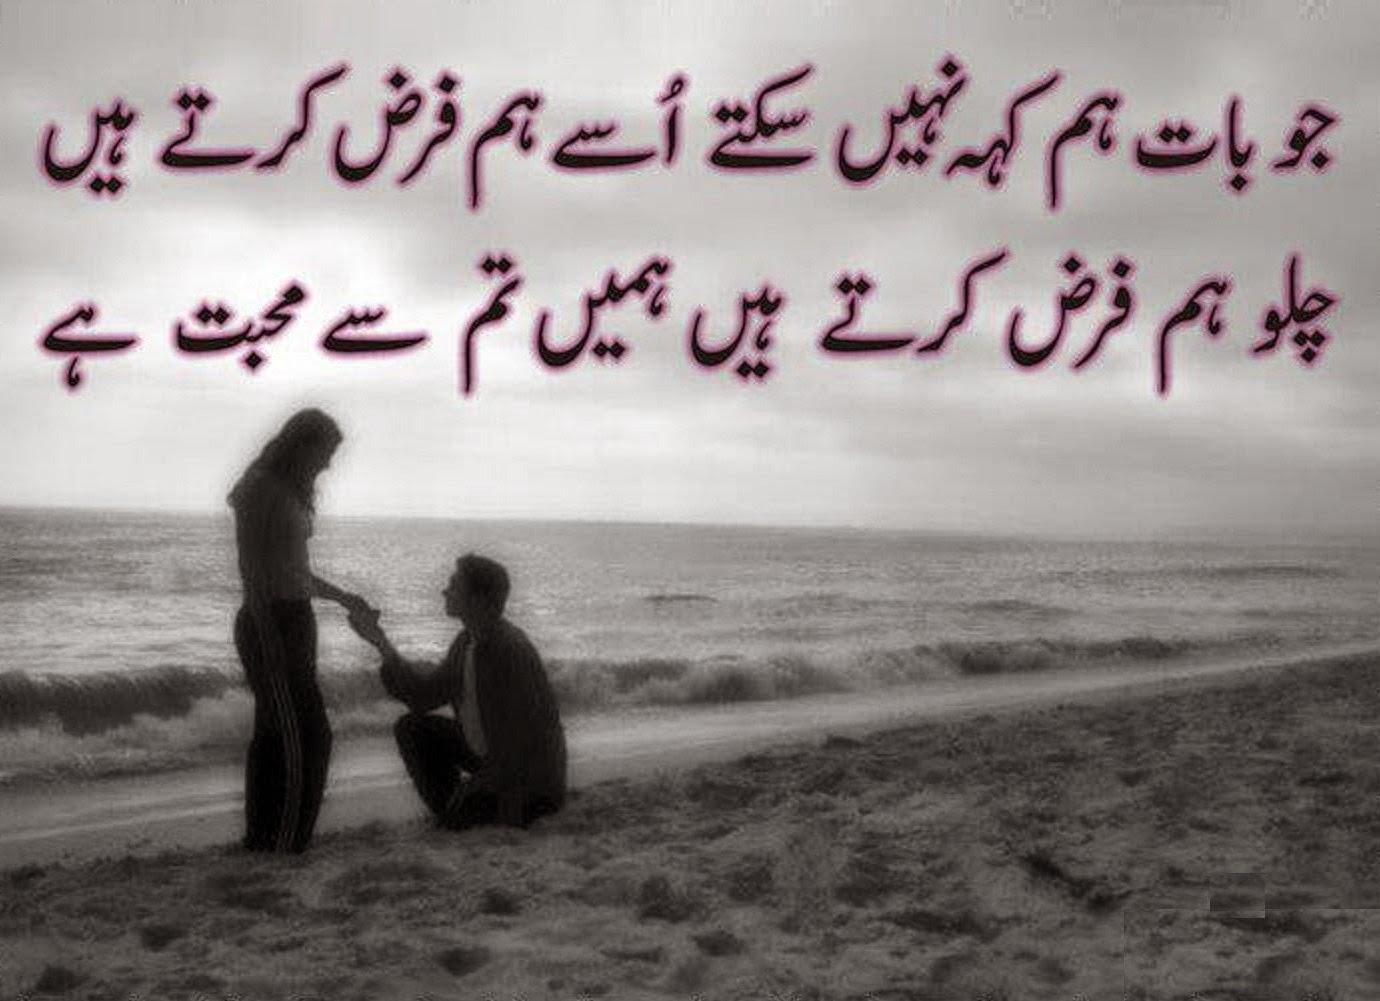 Download HD Wallpapers 3D Beautiful Sad Urdu Poetry HD 1380x1001